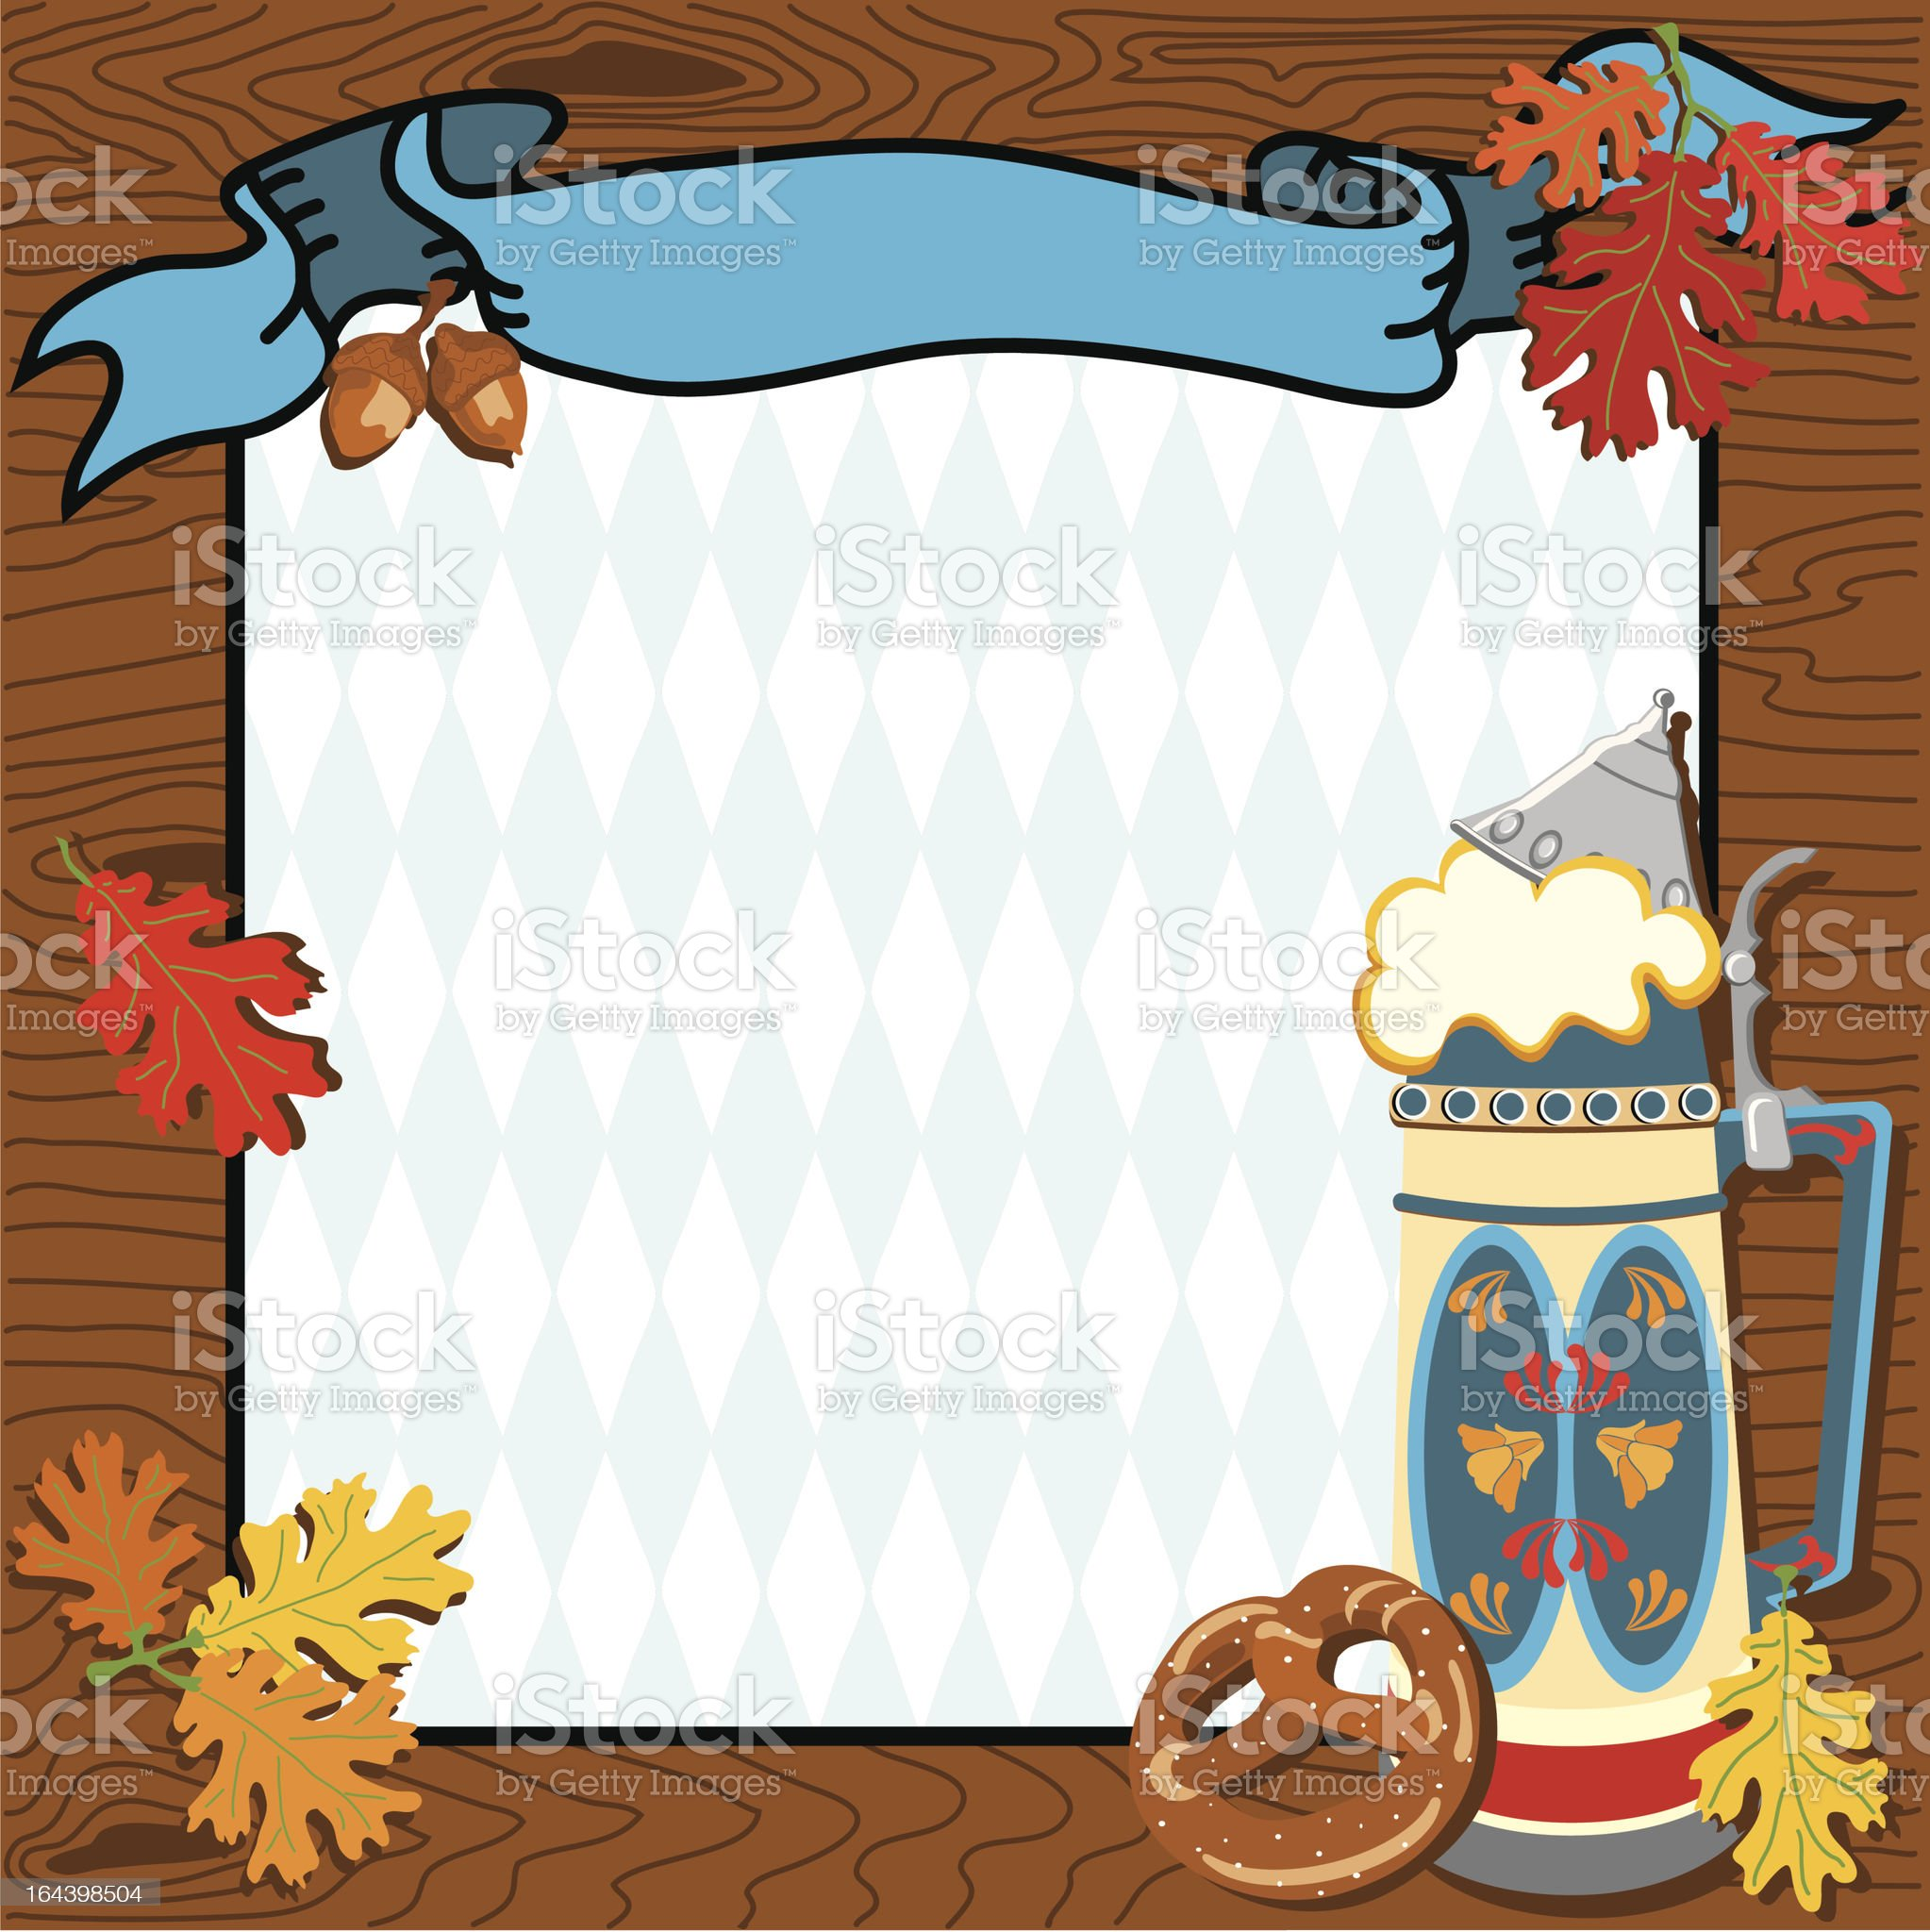 Oktoberfest Frame royalty-free stock vector art